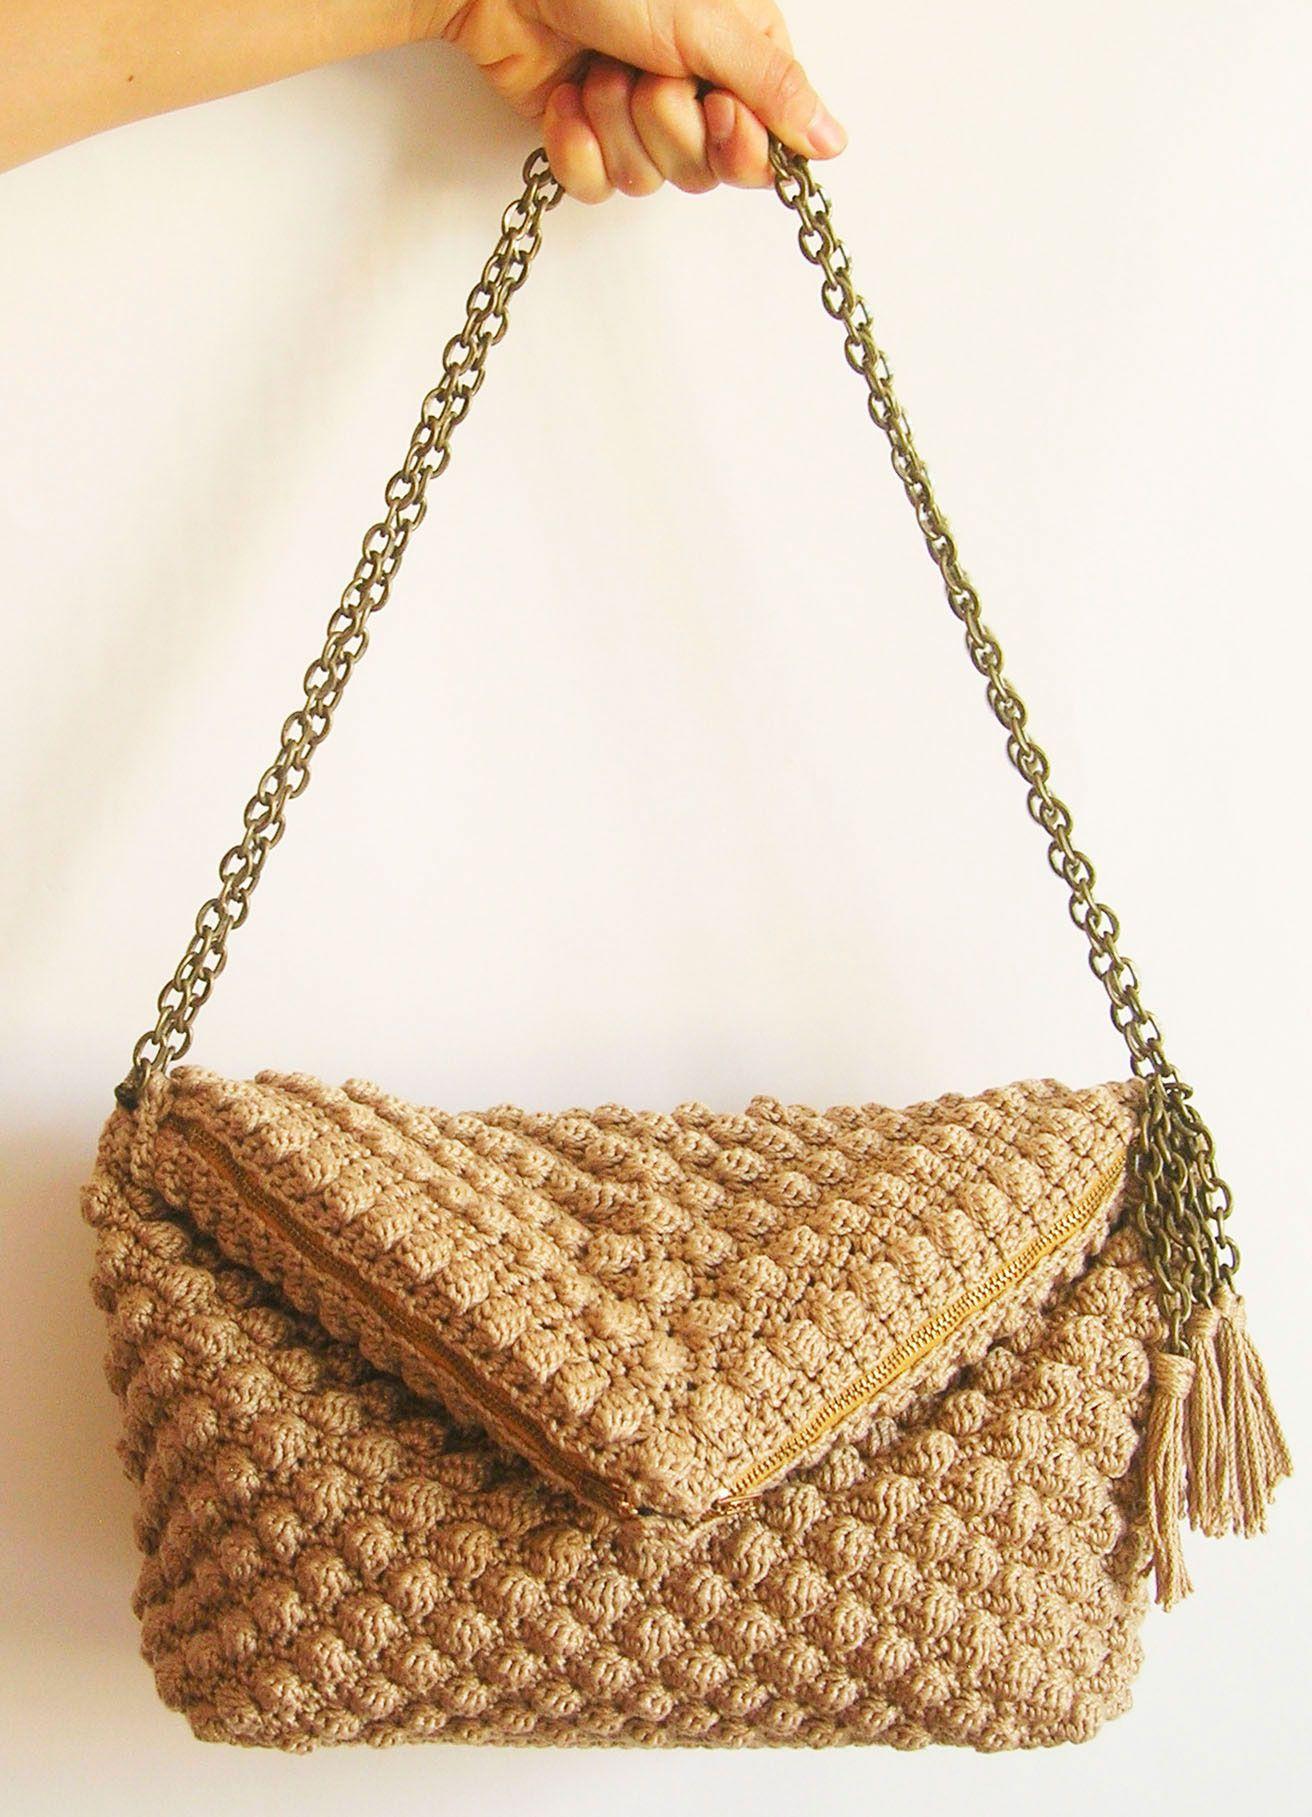 Crochet pattern for bobble stitch bag/ Patrón de gancho para bolso ...